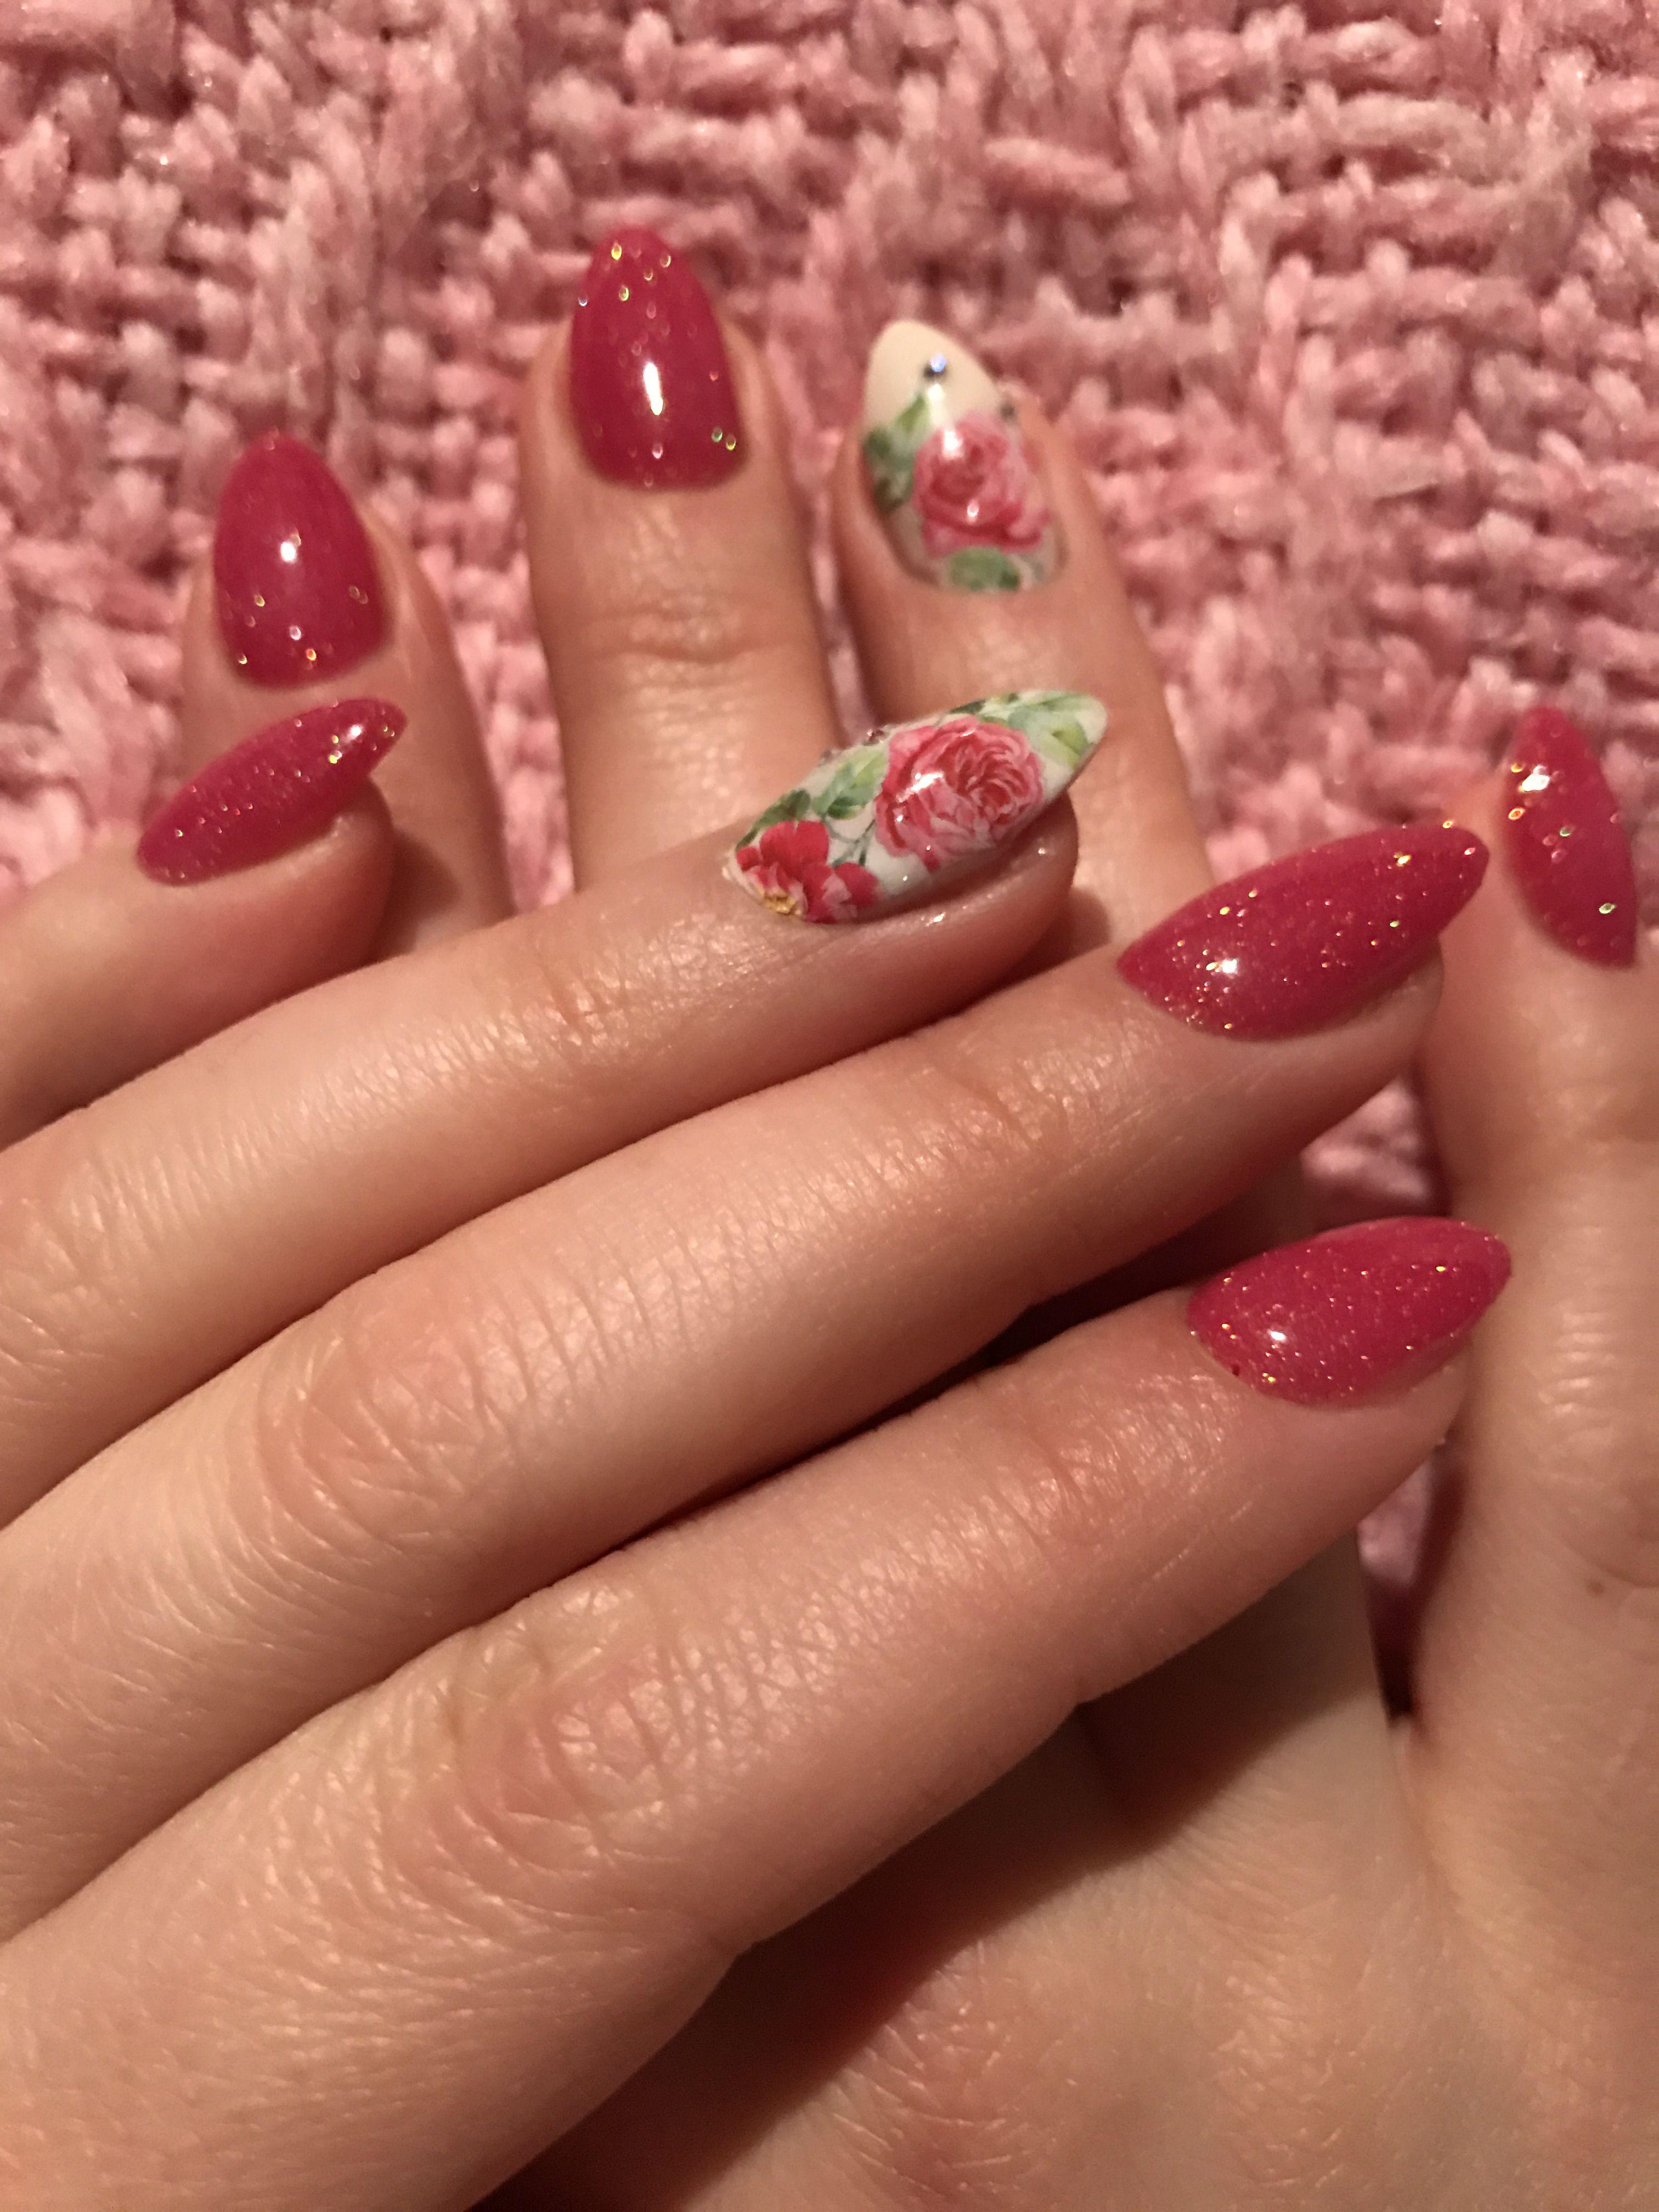 Ricostruzione unghie in gel mandorla color fragola con decoro nail art  redlipsmakeup crystalnails